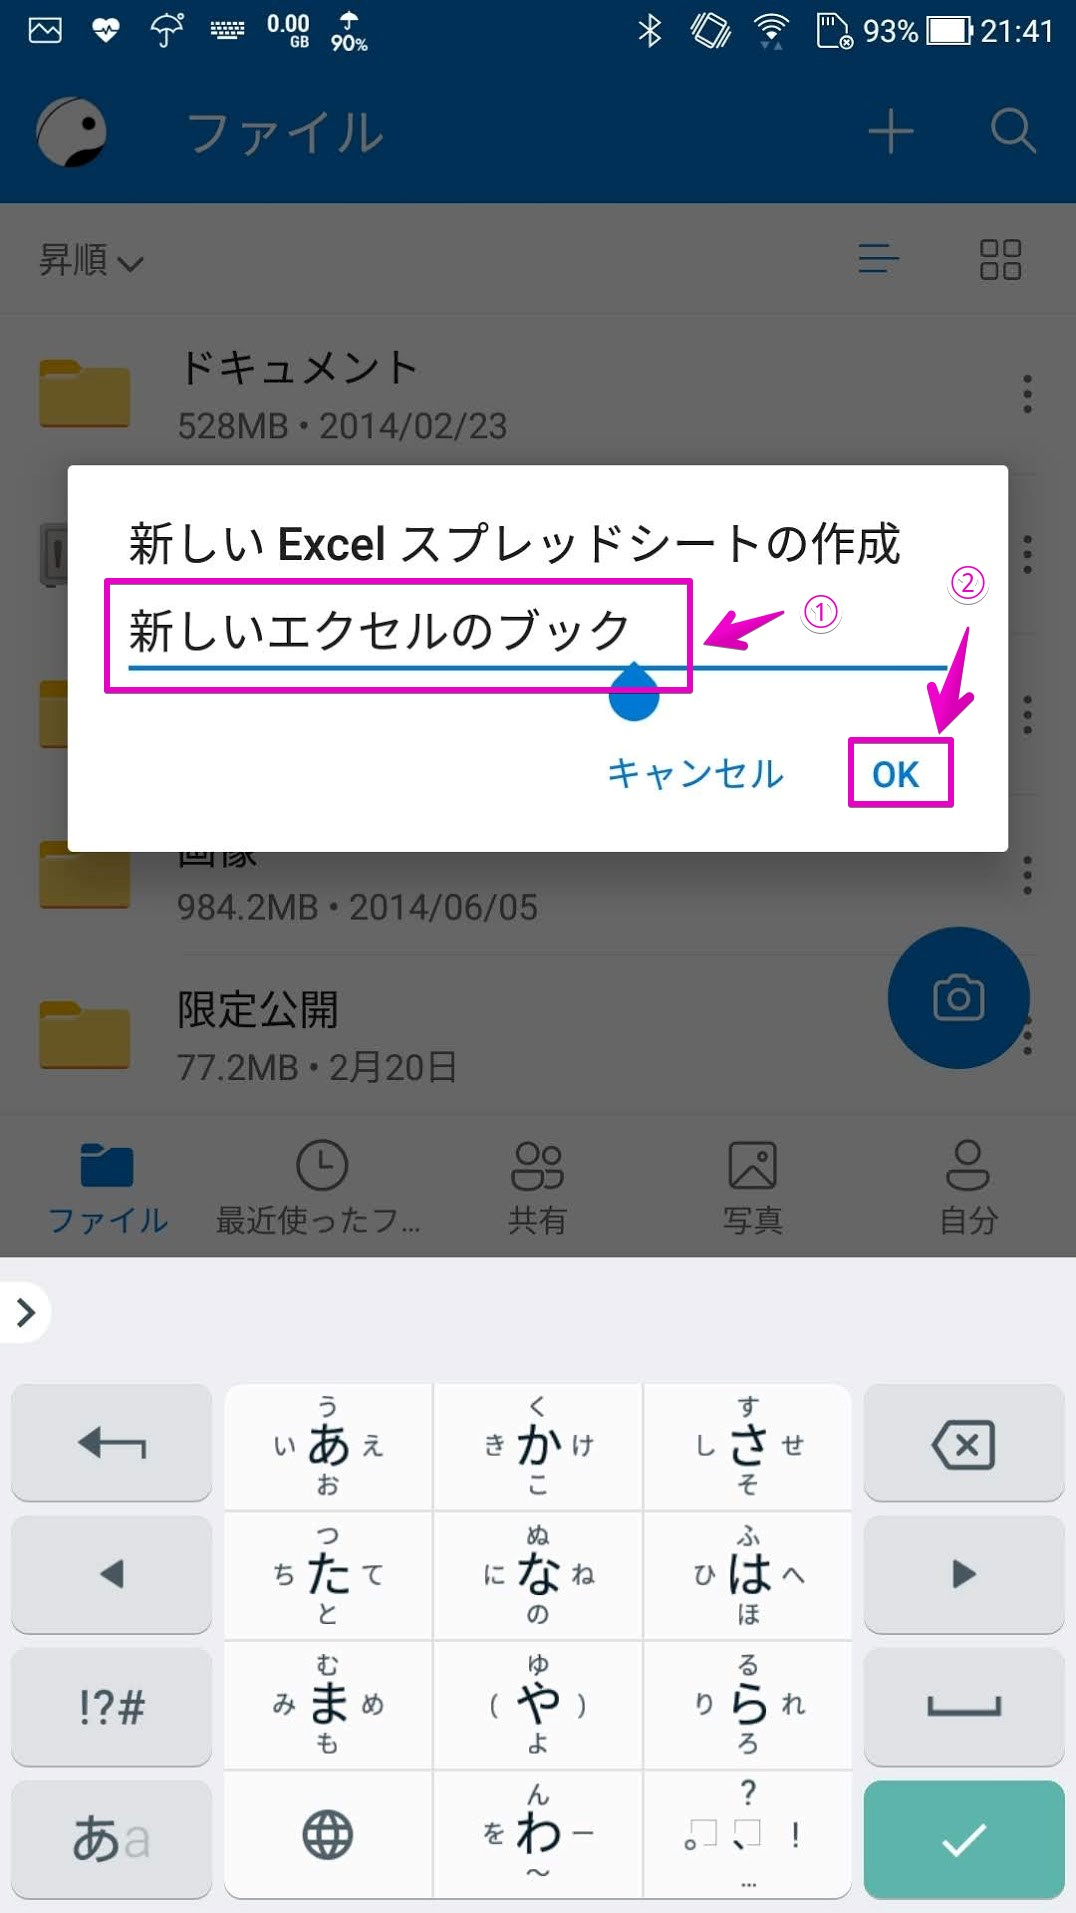 AndroidアプリでOneDriveに新しいファイルの作成